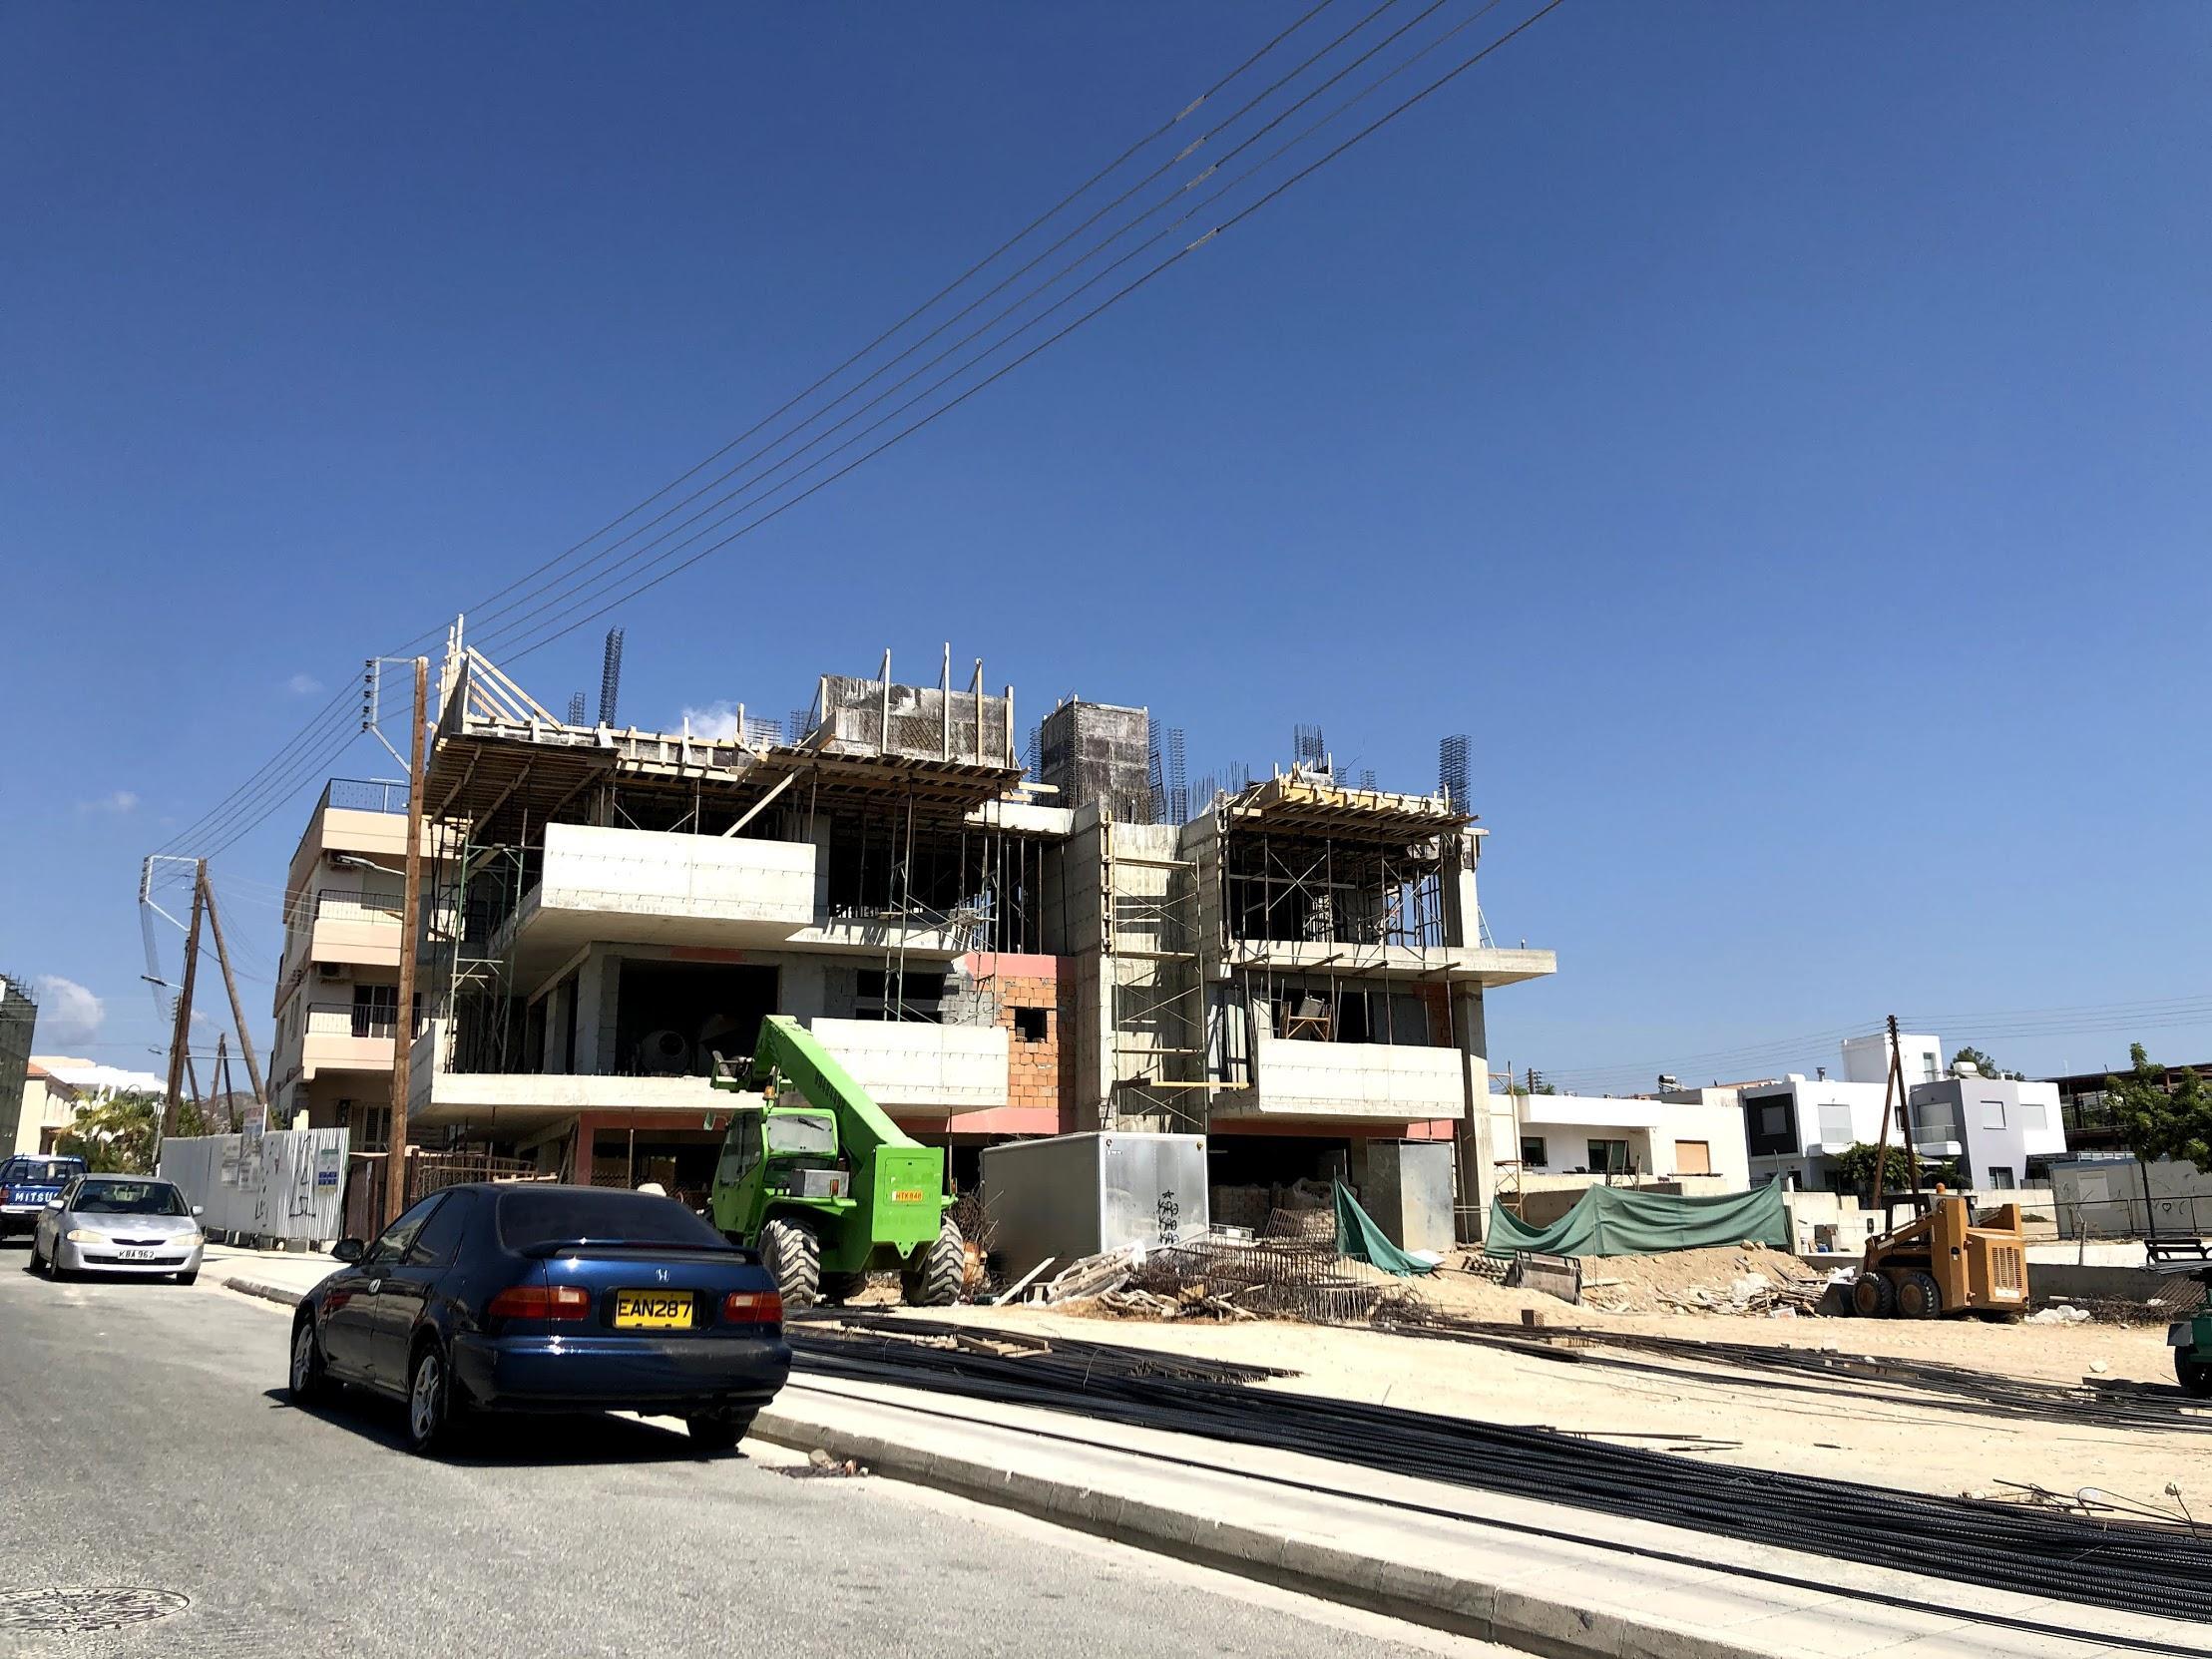 На Кипре прошёл бум на небоскрёбы